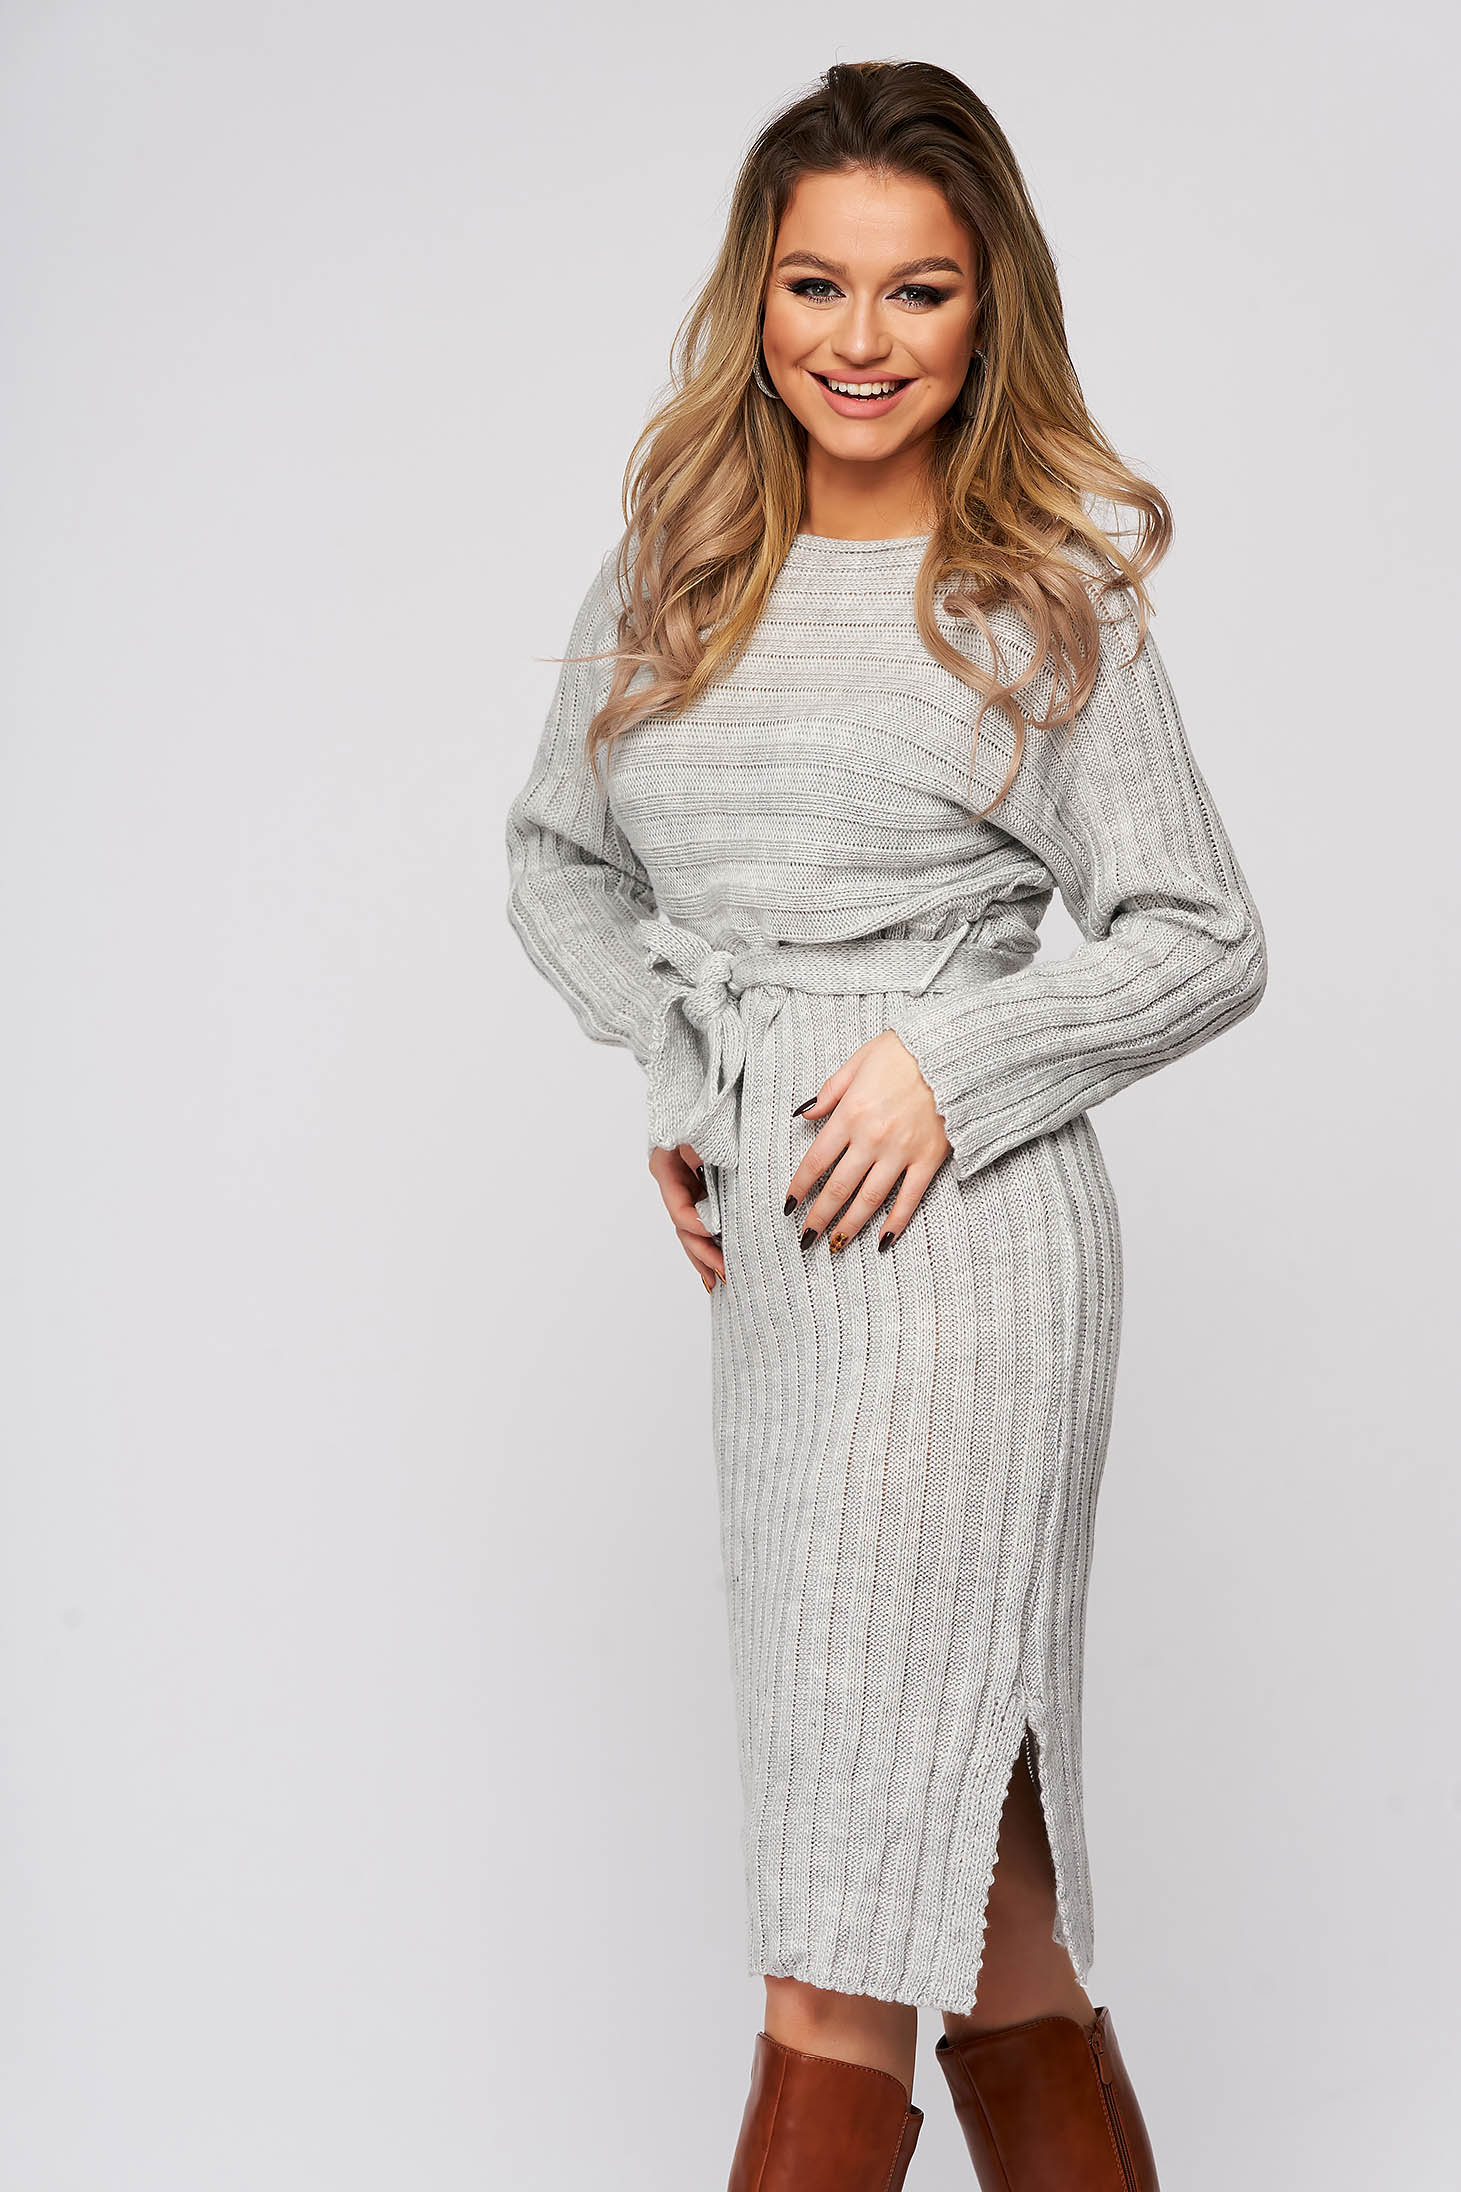 Rochie gri din tricot subtire, elastic, reiat, accesorizata cu cordon